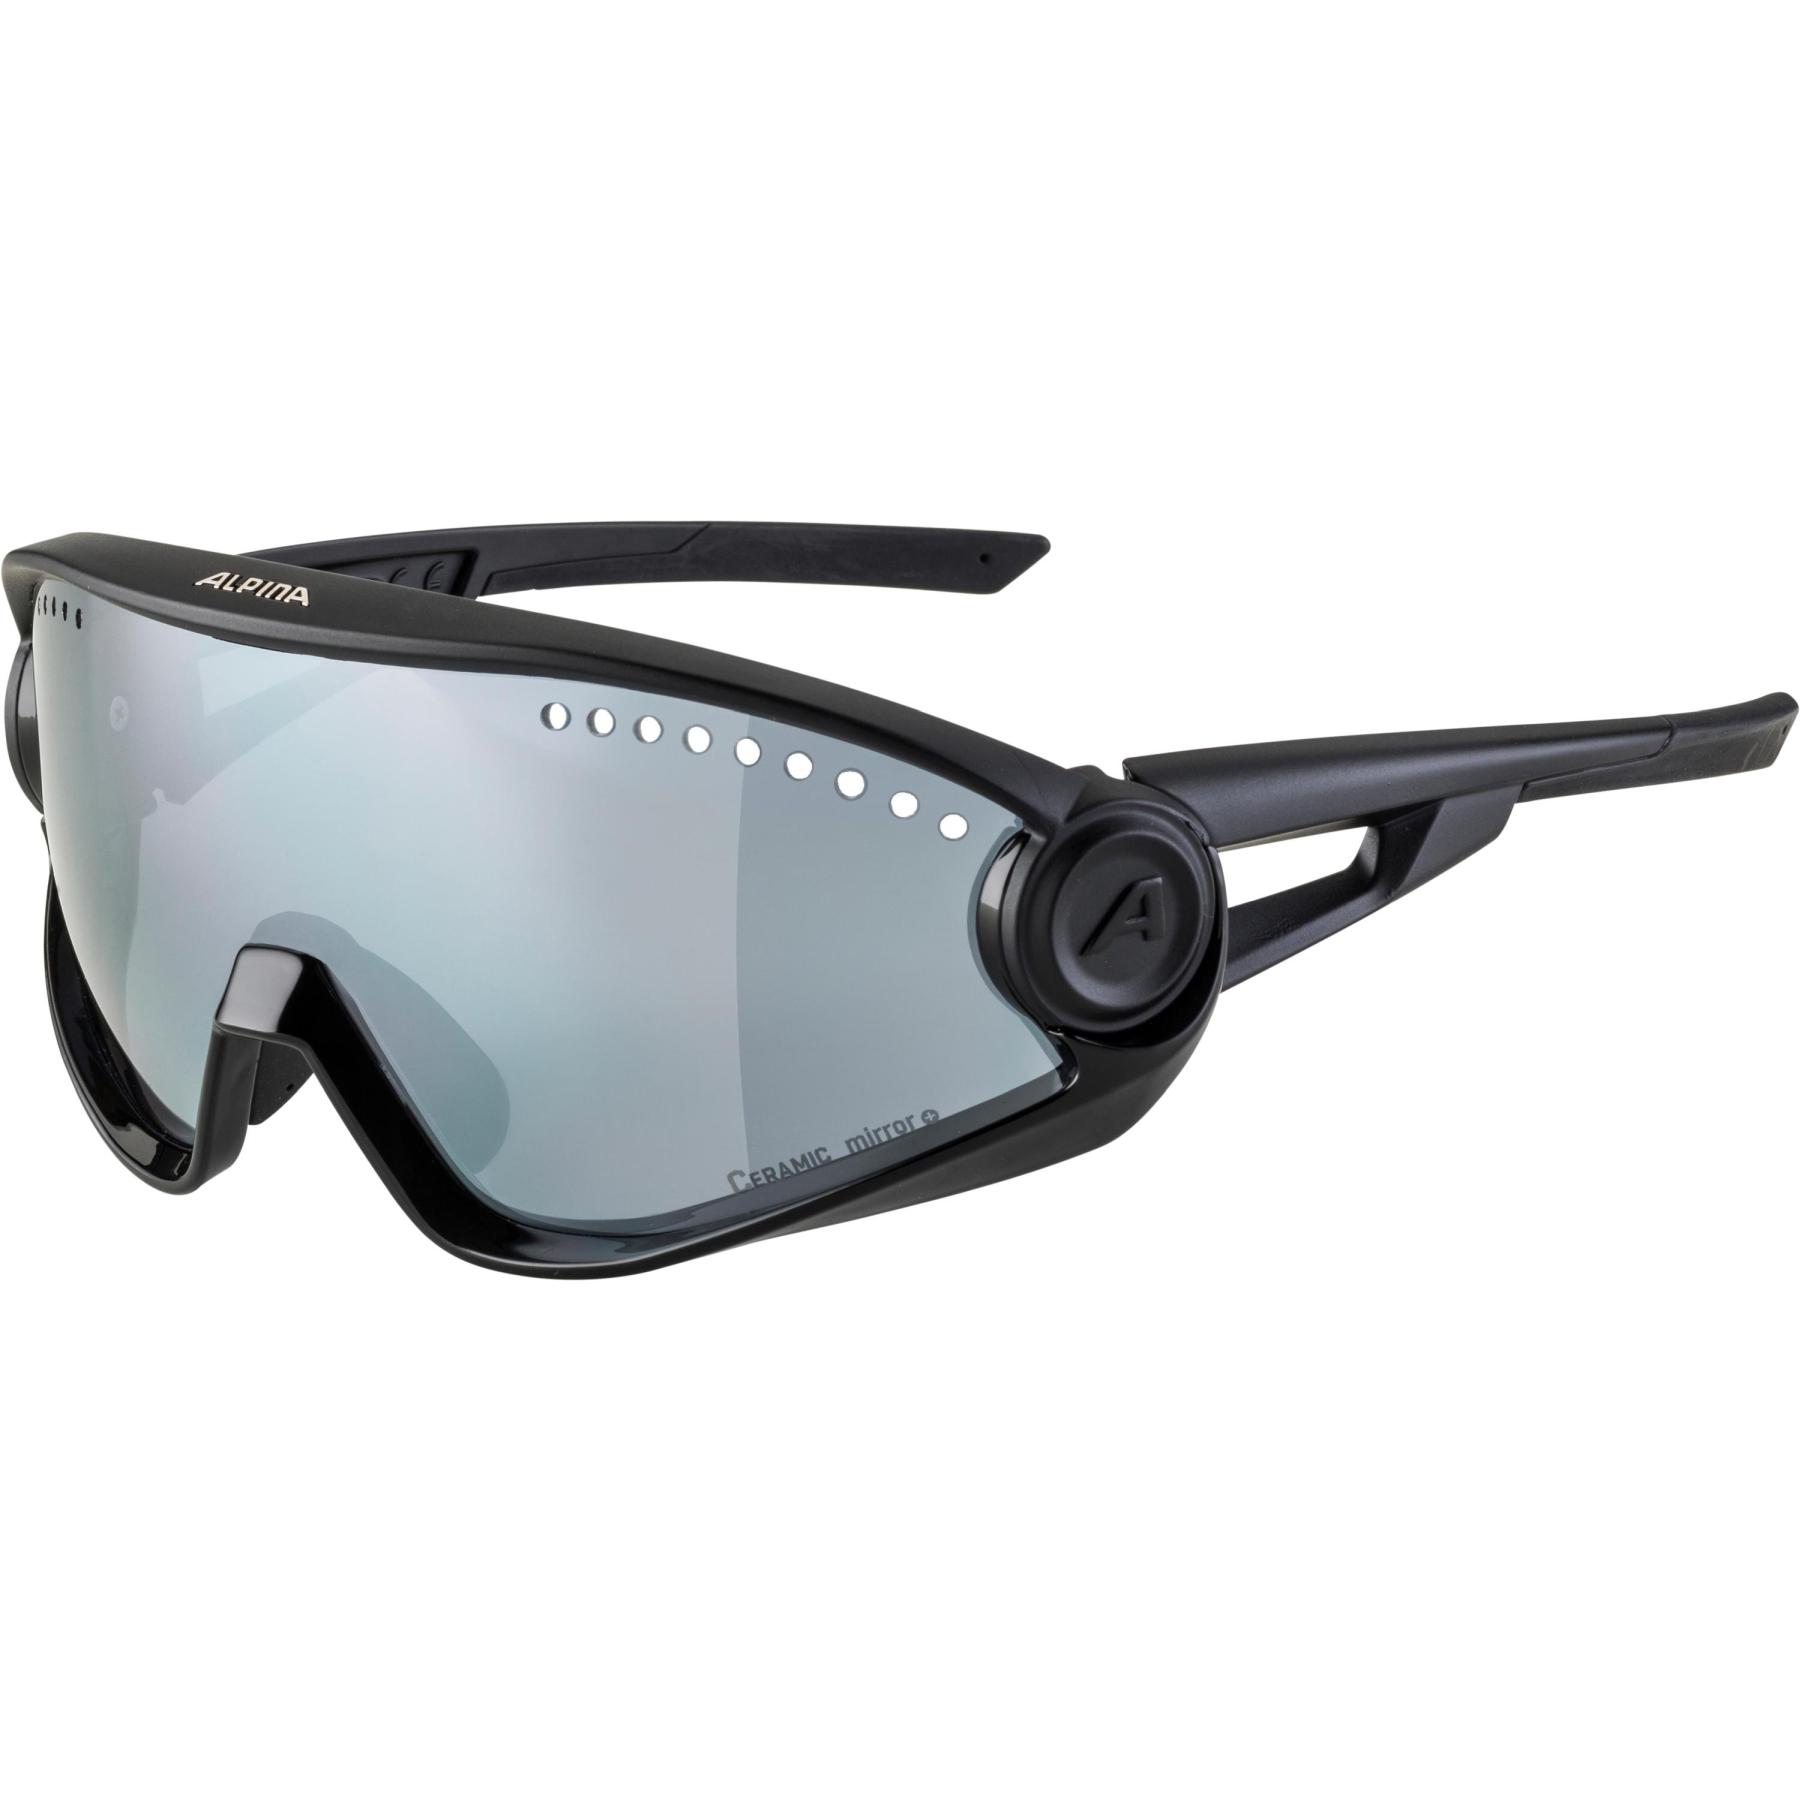 Alpina 5W1NG CM+ Glasses - all black / black mirror